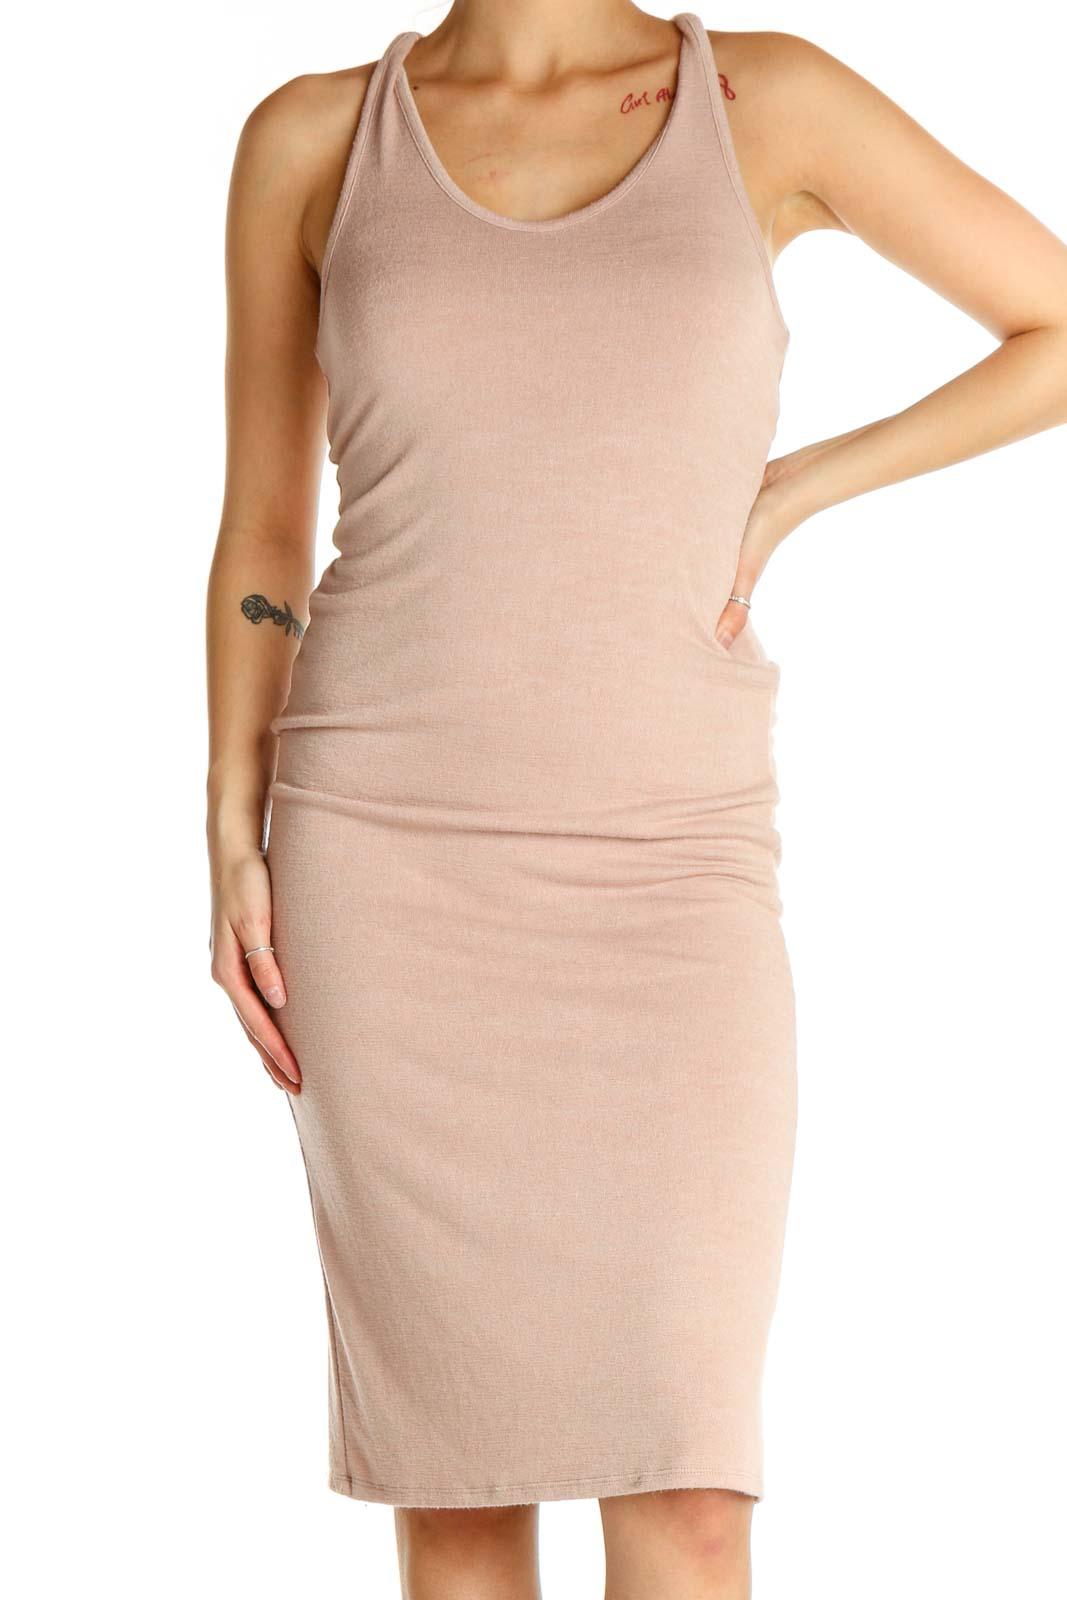 Beige Solid Classic Sheath Dress Front